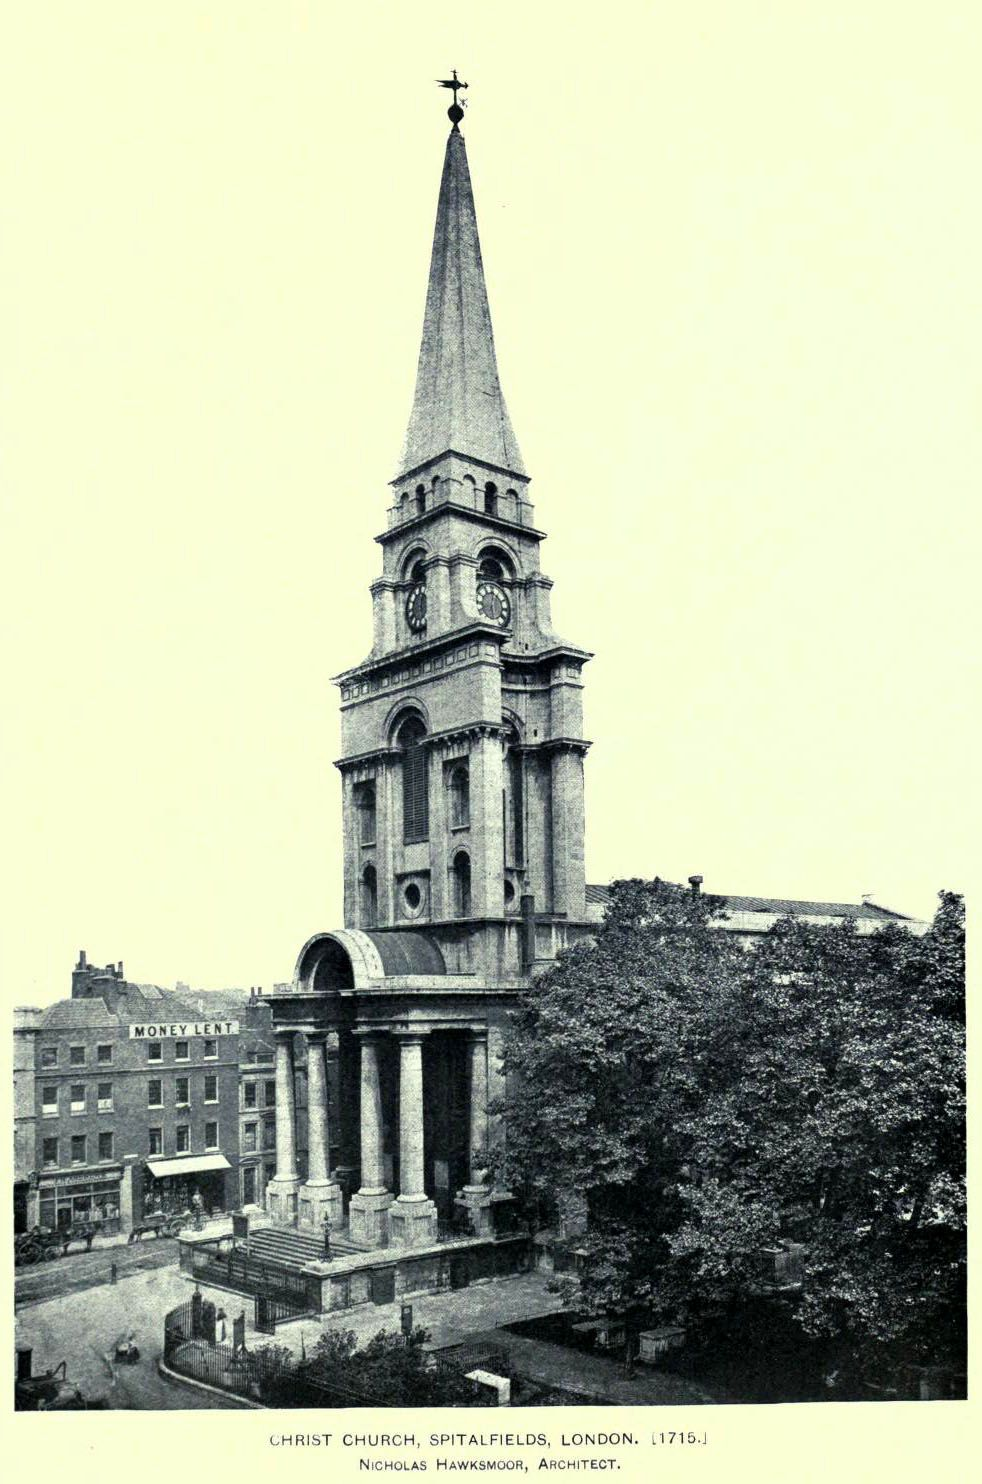 Spitalfields London: Christ Church In Spitalfields, London, Nicholas Hawksmoor